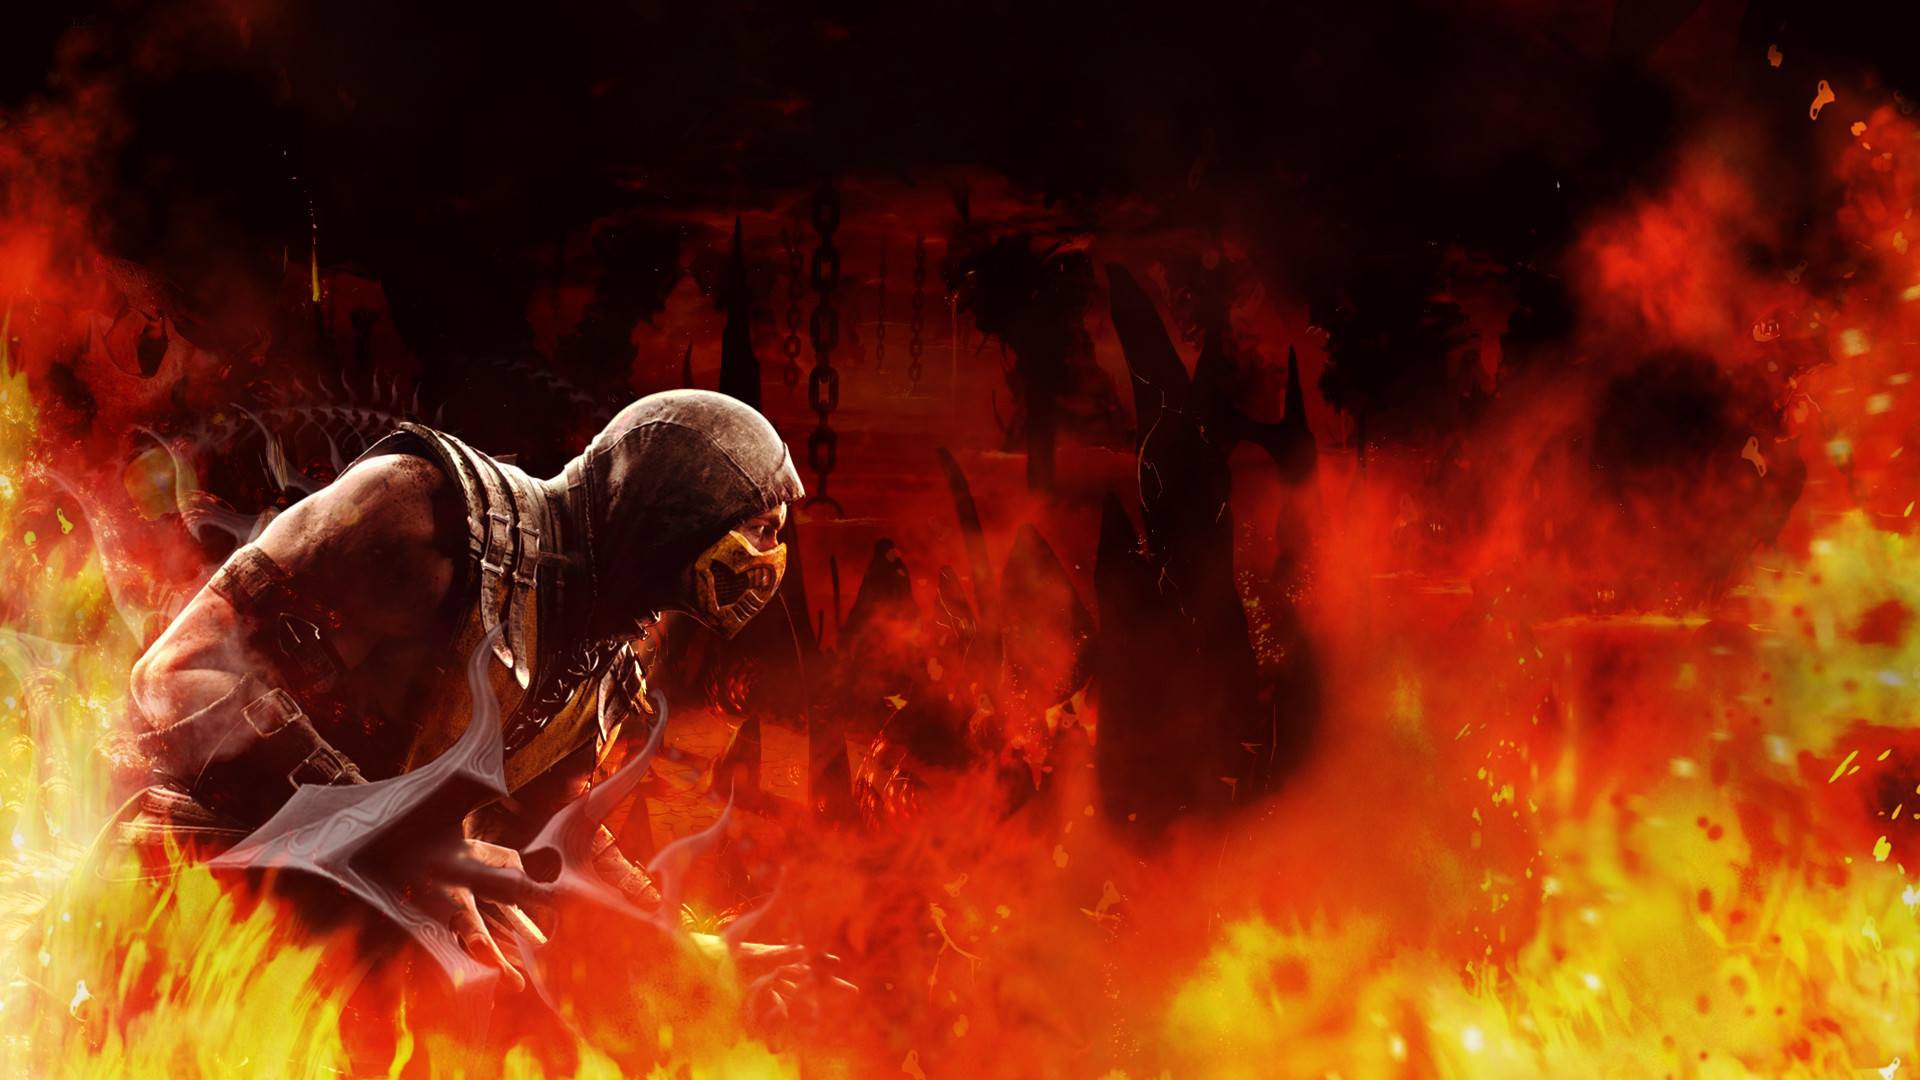 Mortal Kombat Scorpion Wallpaper (68+ Images